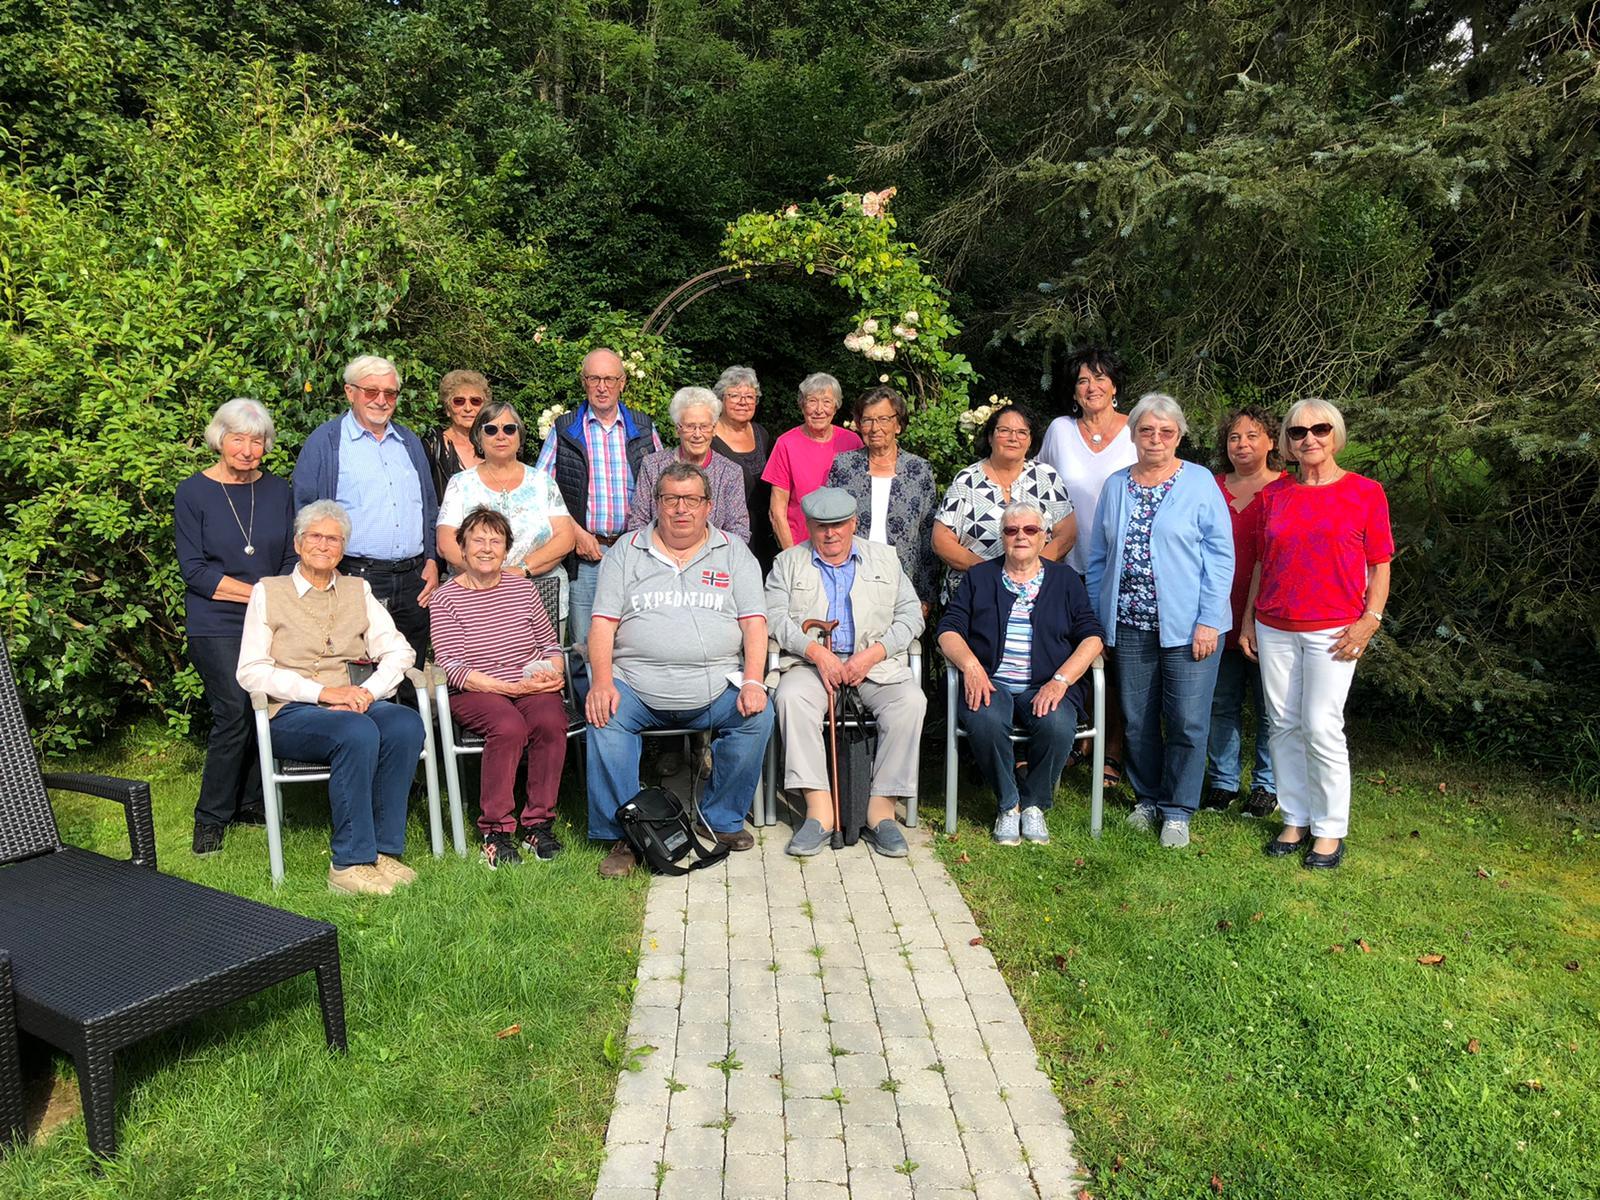 AWO-Reise zum Staatsbad Bad Brückenau vom 8.-11.Aug. 2021